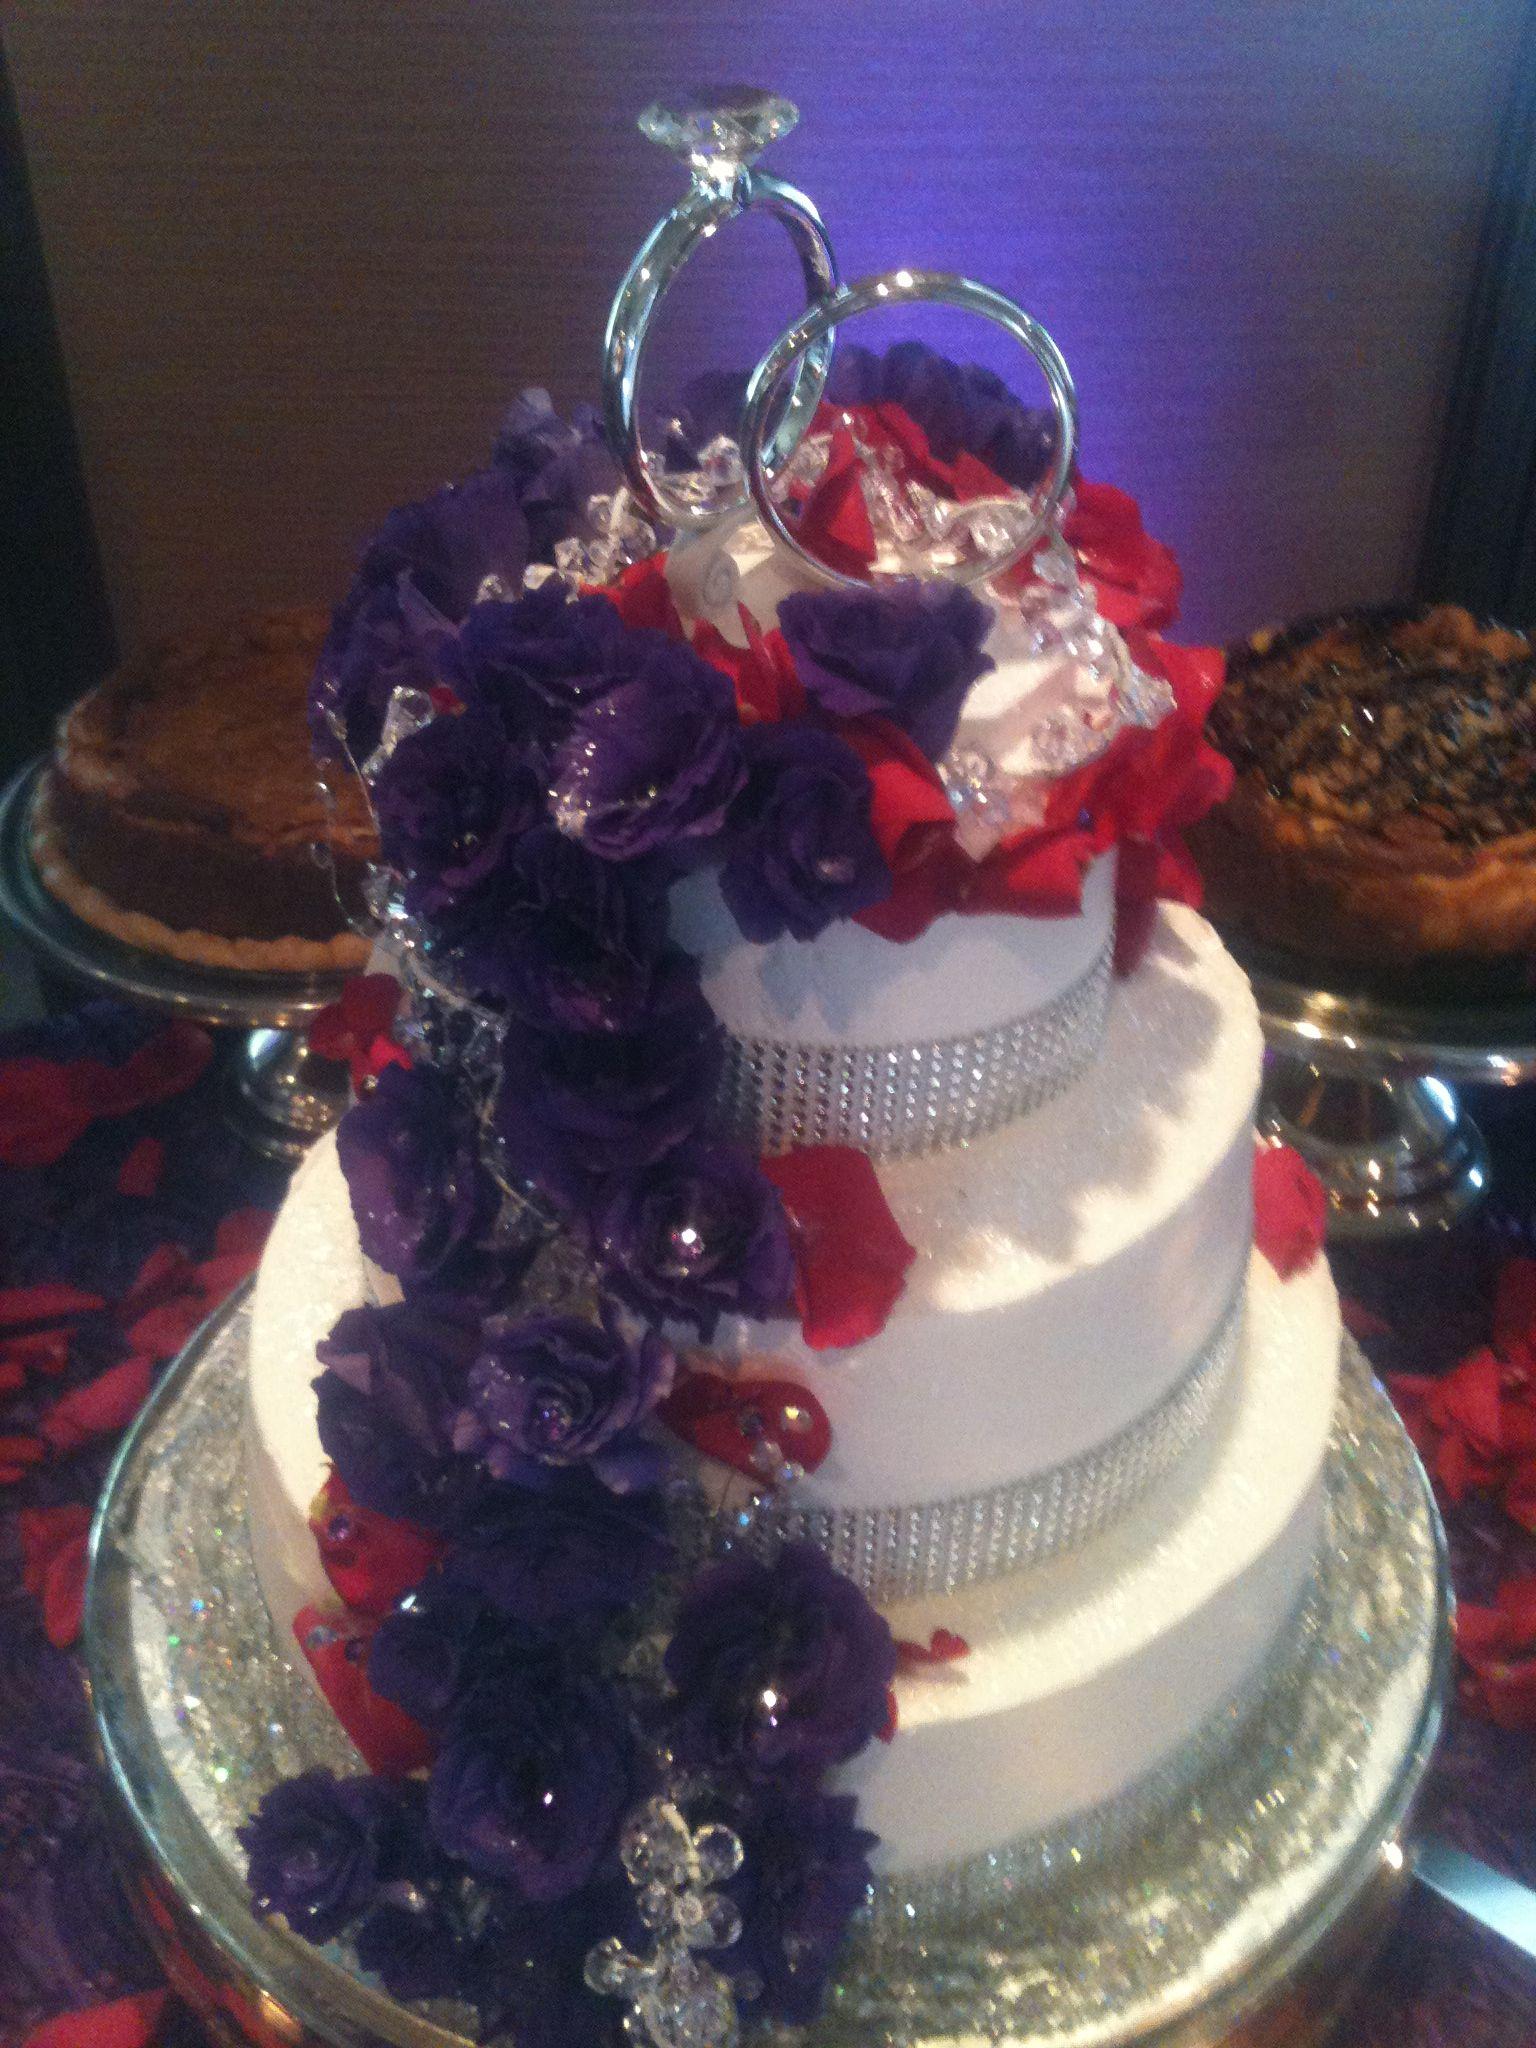 Purple & Red Ring Glitz & Glamor wedding cake with side